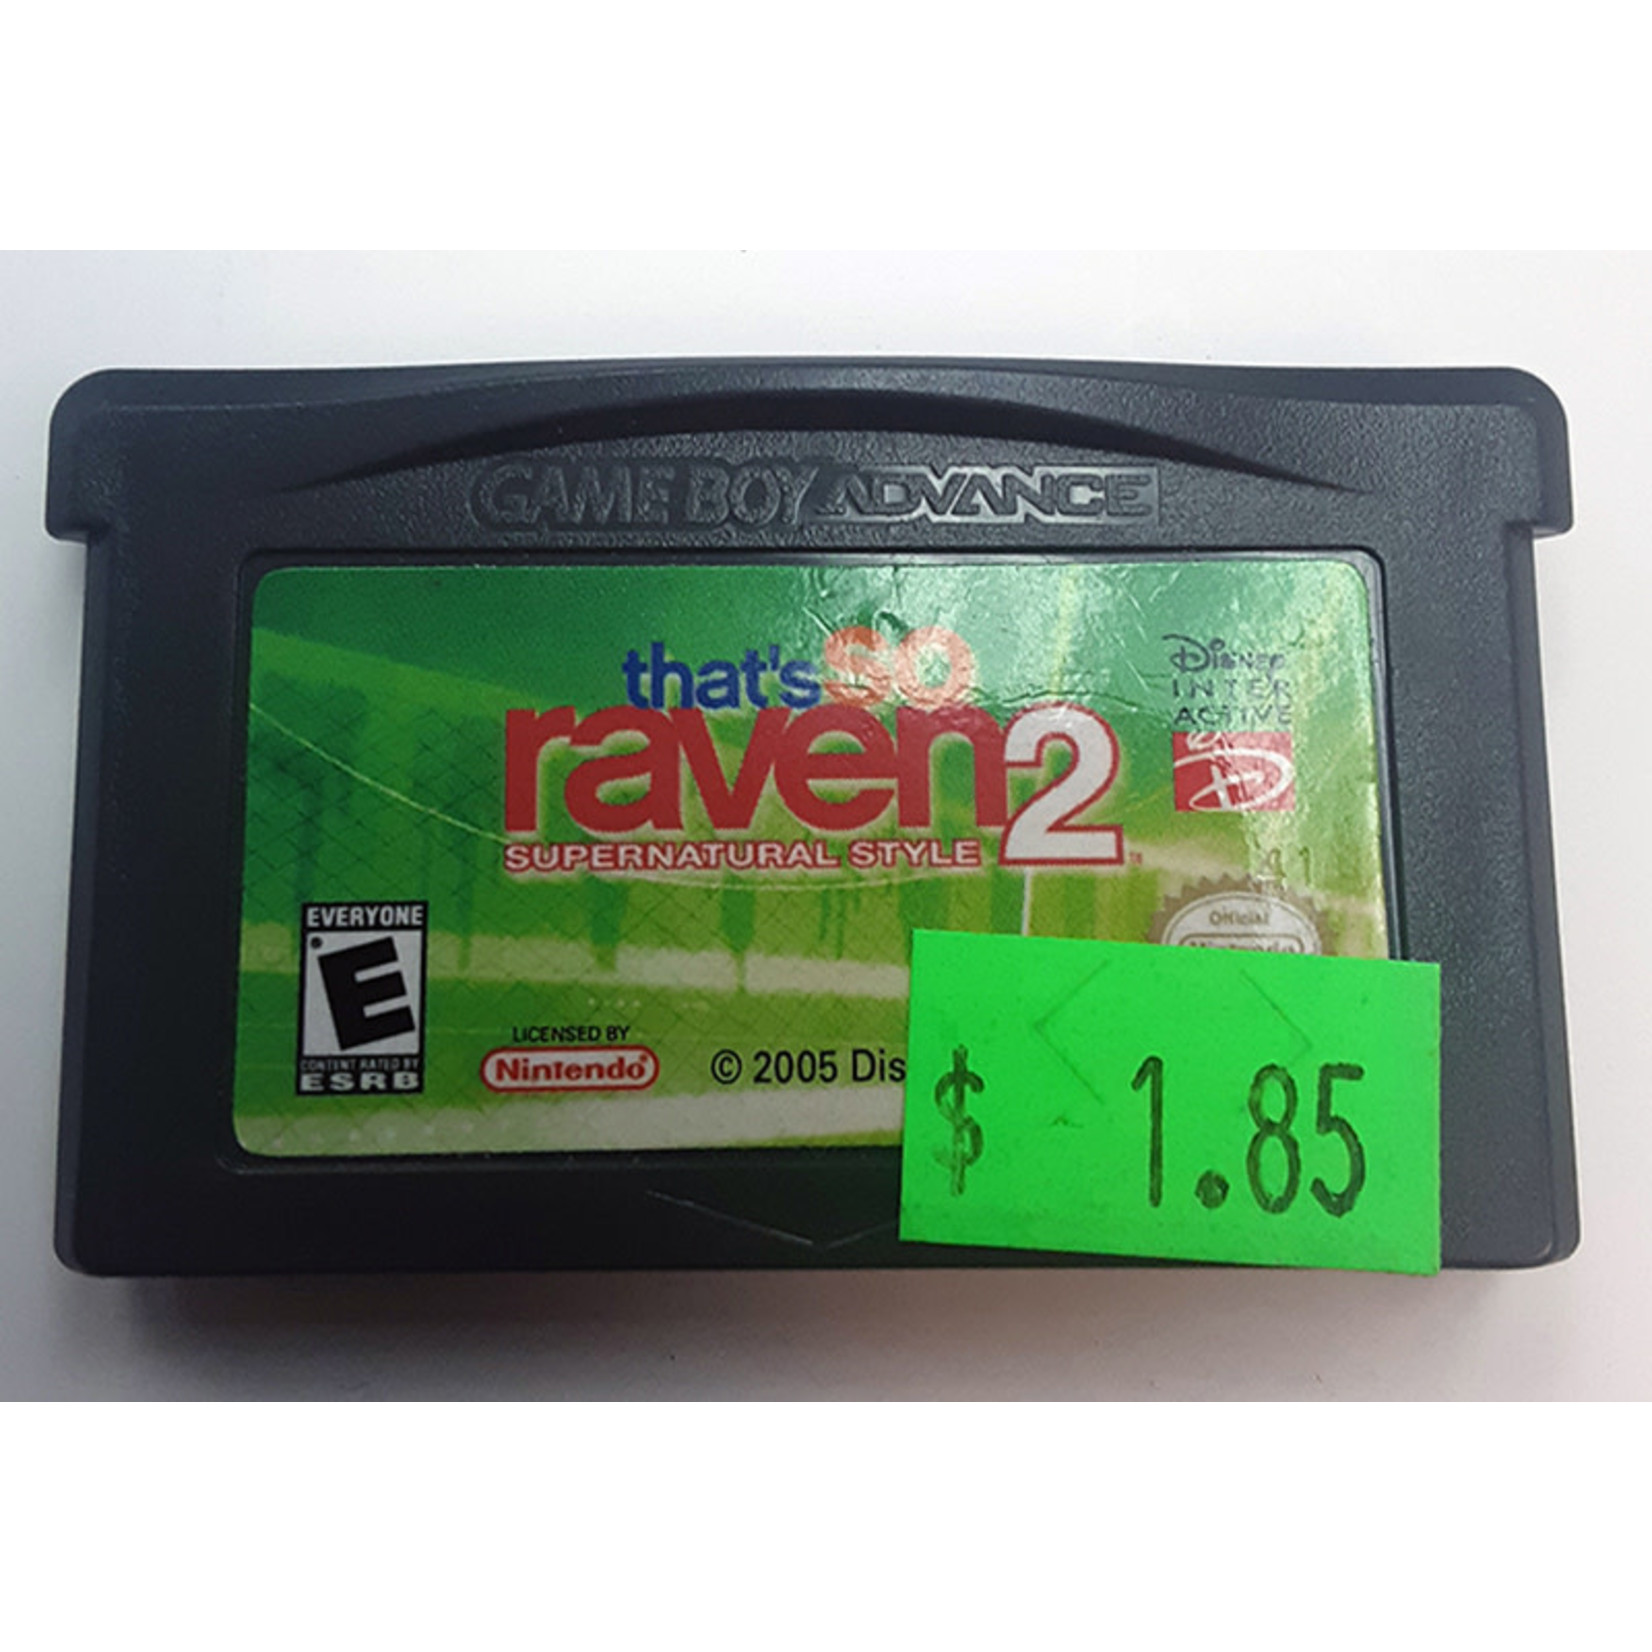 GBAu-That's So Raven 2 Supernatural Style (cartridge)